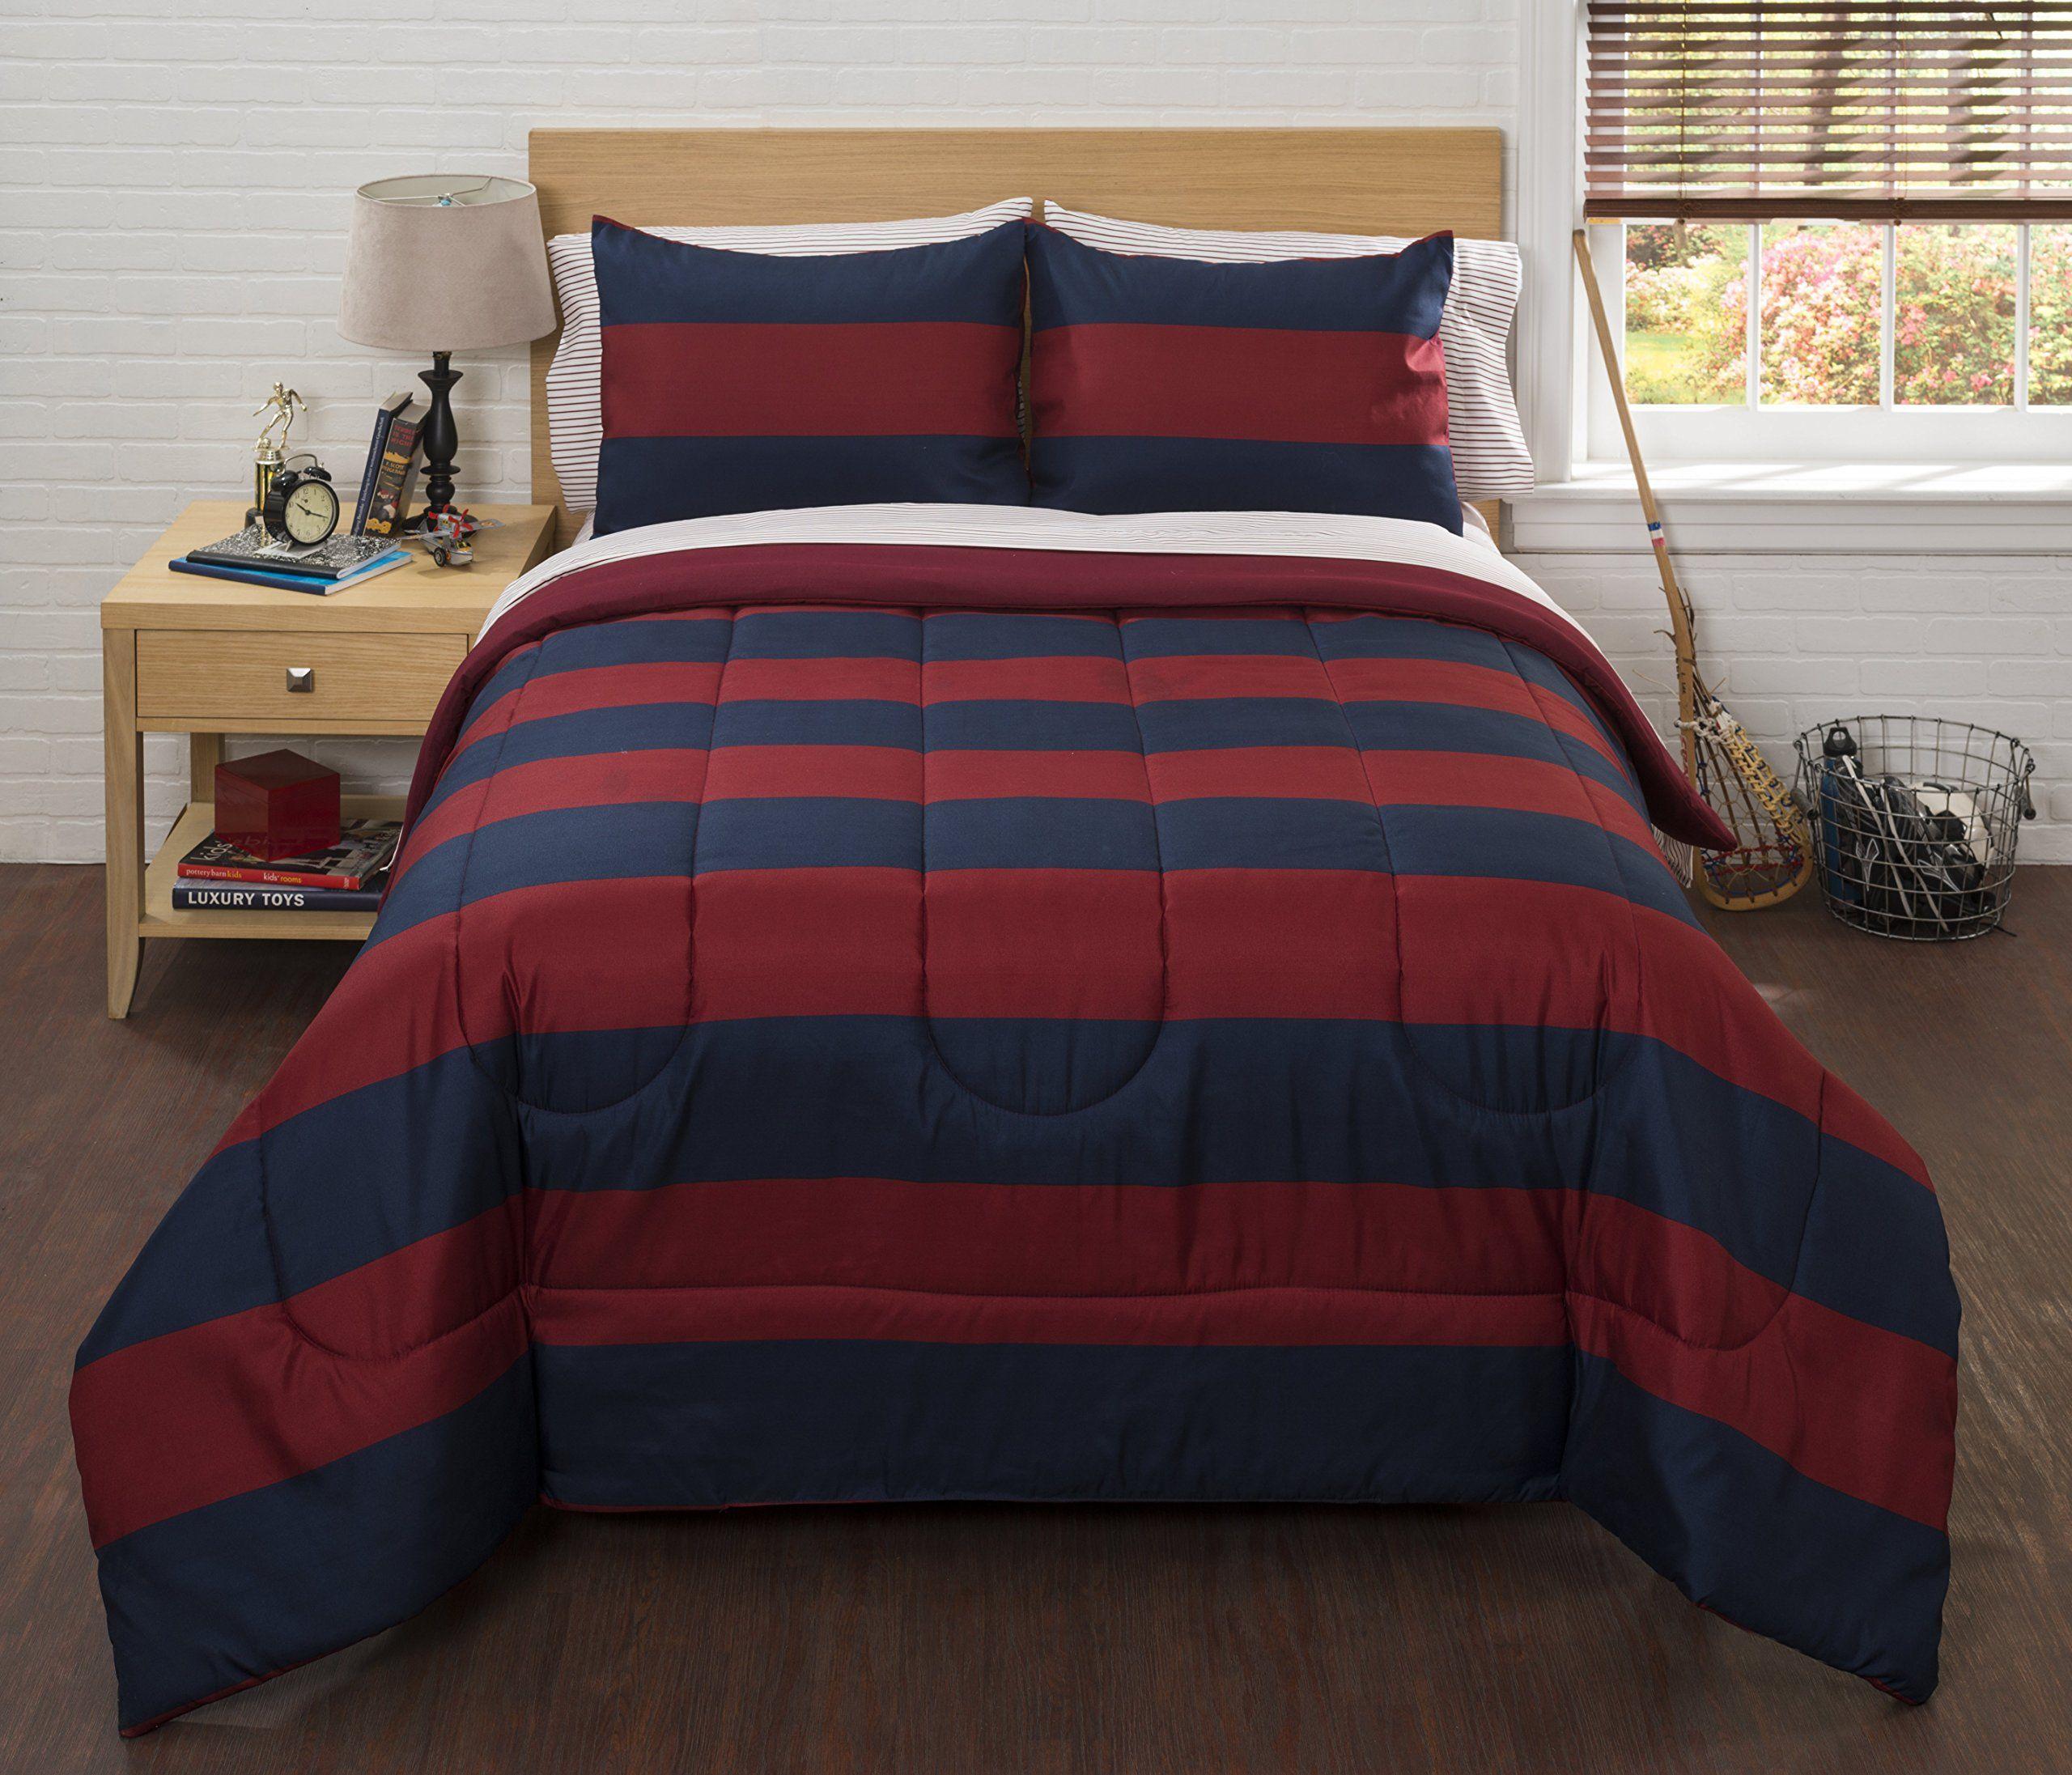 American Kids BK685980 Rugby Stripe Comforter Set Full 86